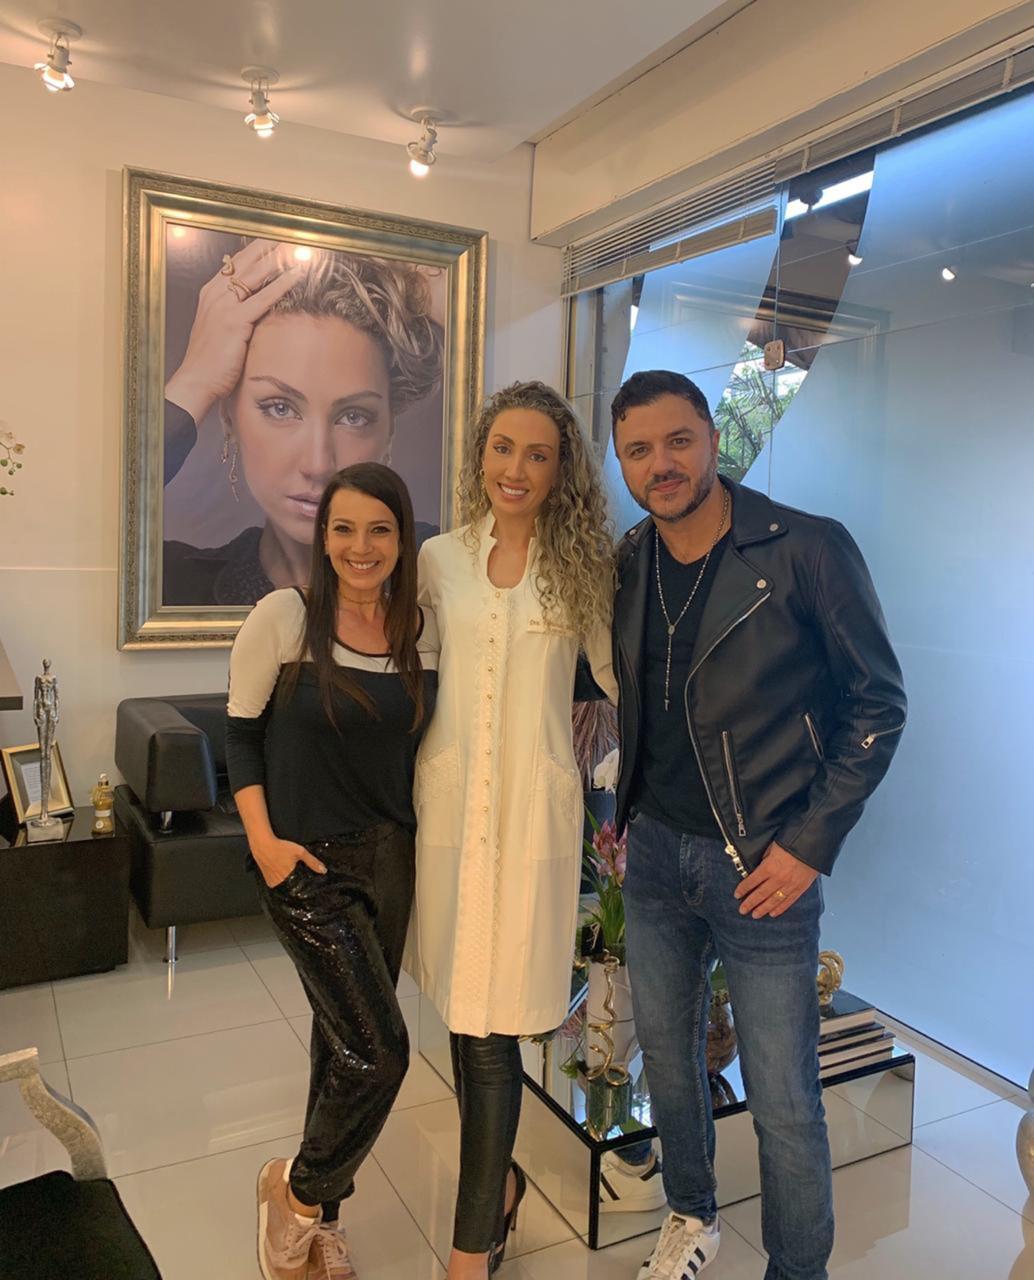 Maurício Manieri passa tarde em clínica luxuosa de beleza